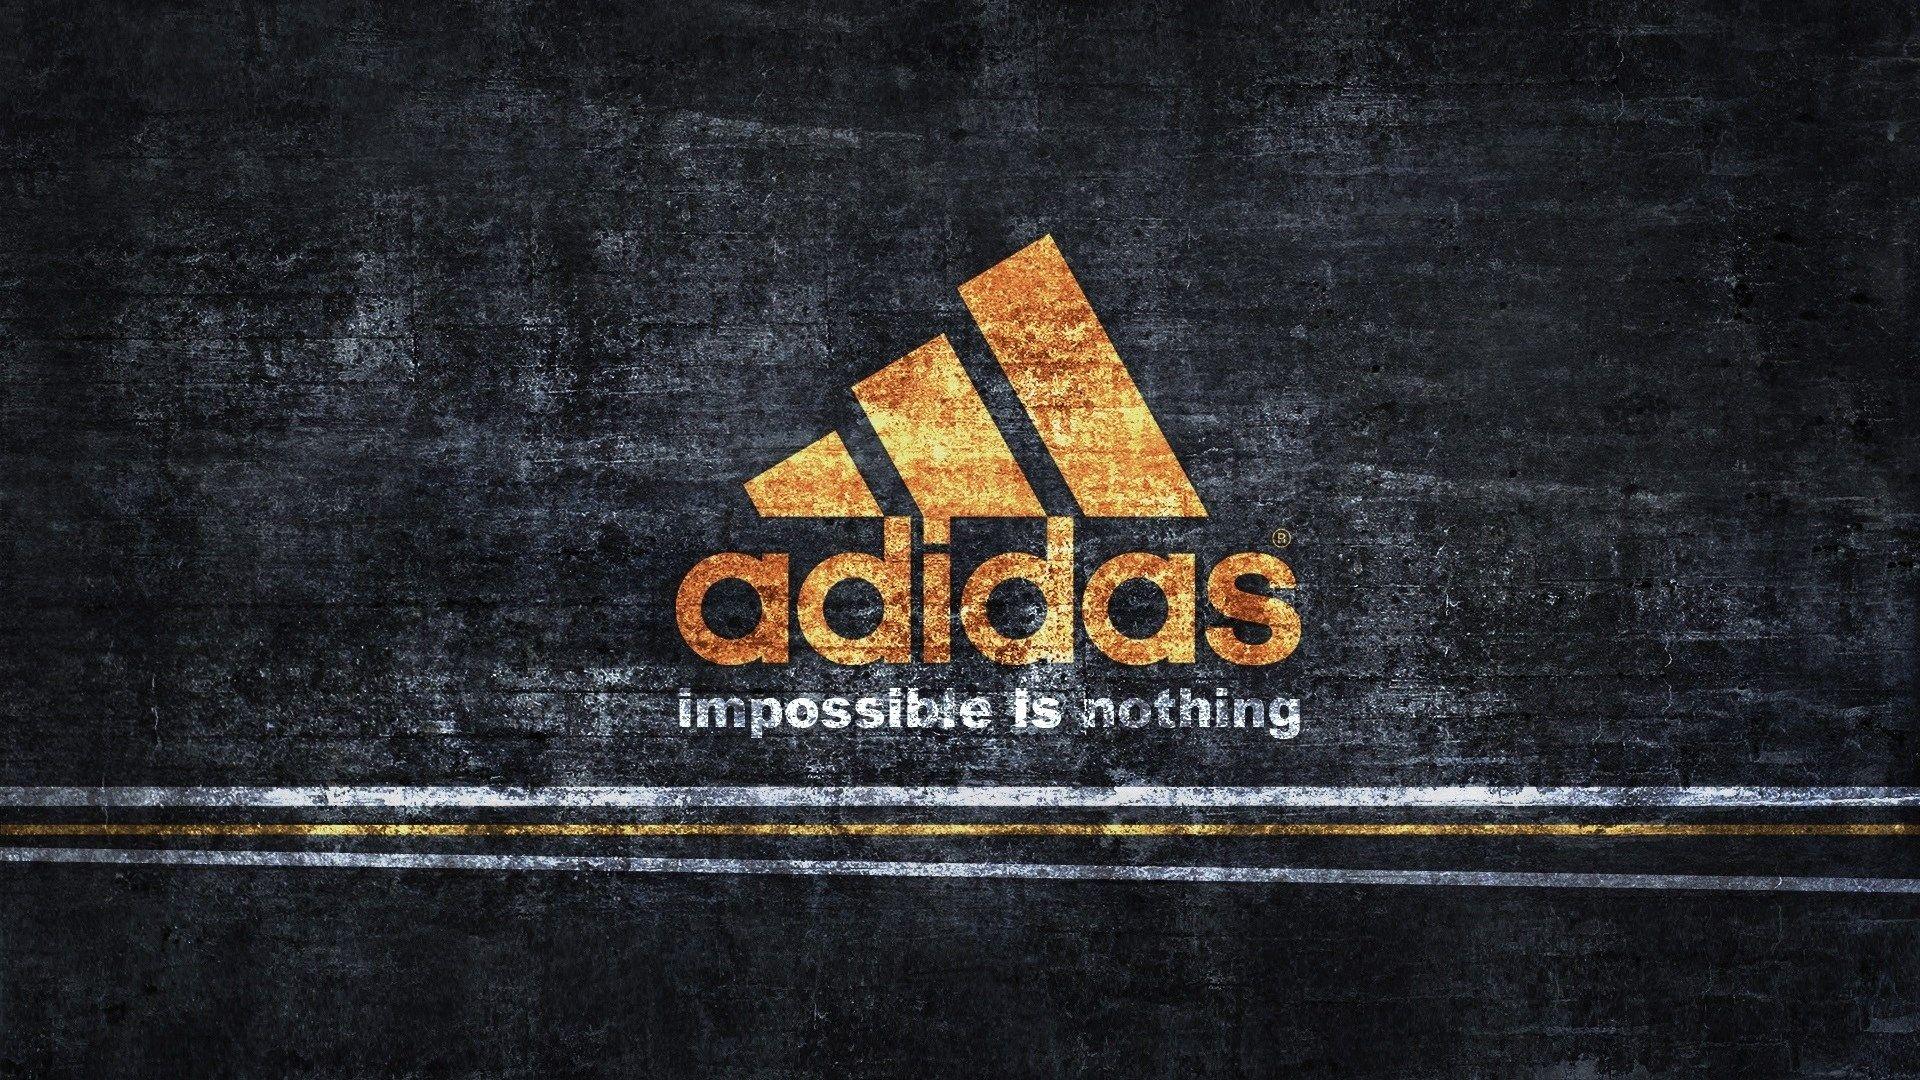 Good Wallpaper High Quality Adidas - 95db6142c566942f5872dcf7805b5ee7  Pictures_56139.jpg